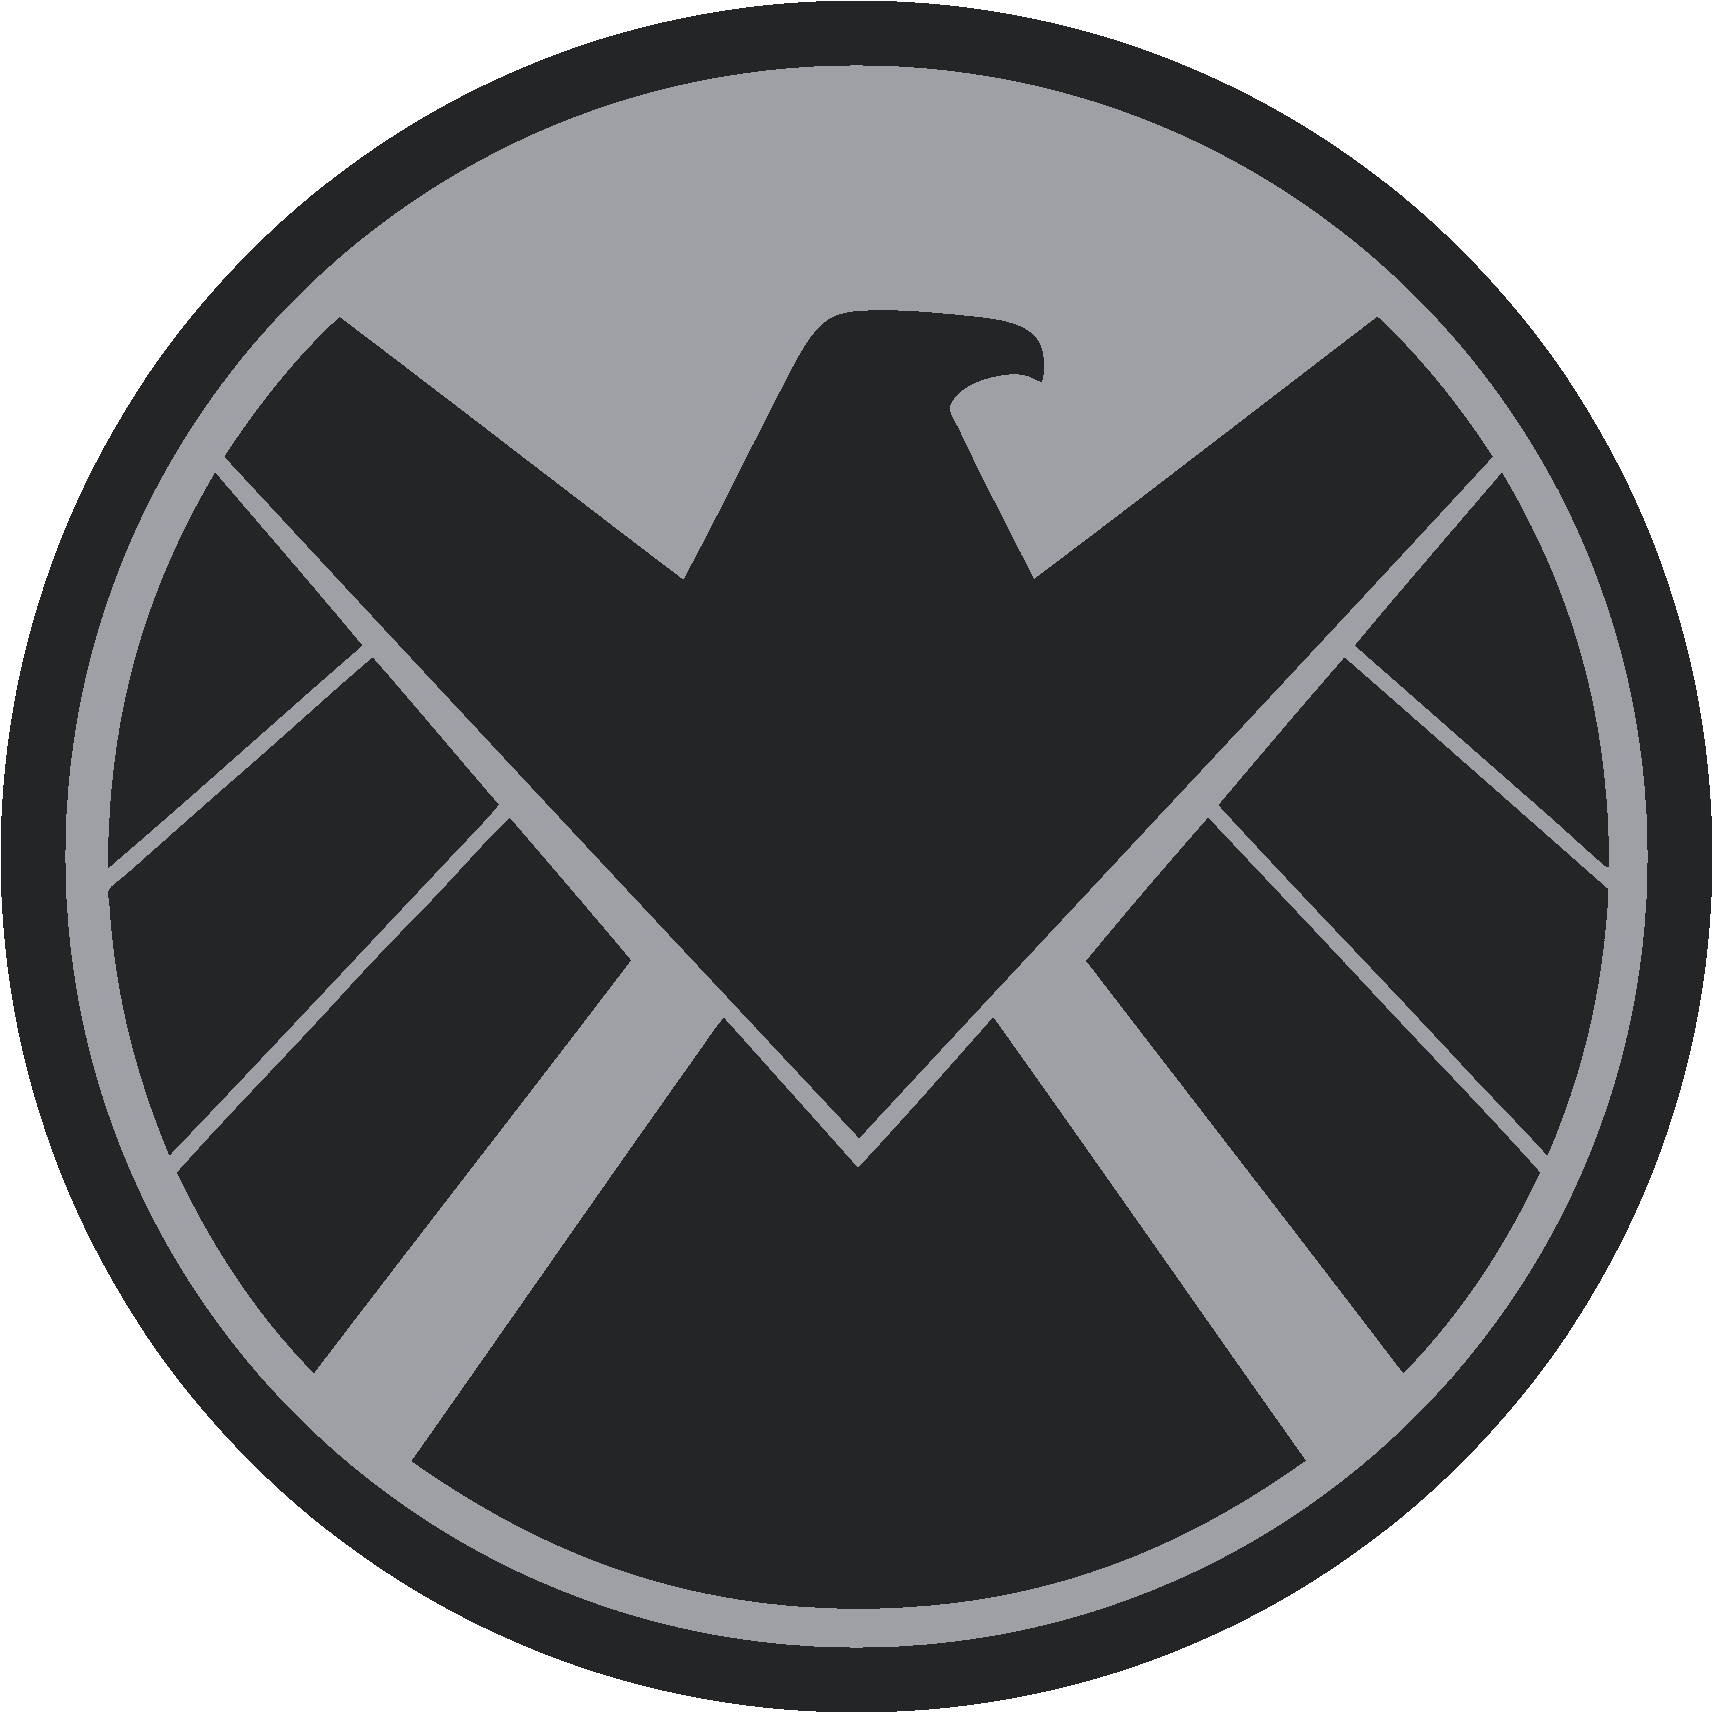 Image Shield Profileg Marvel Cinematic Universe Wiki